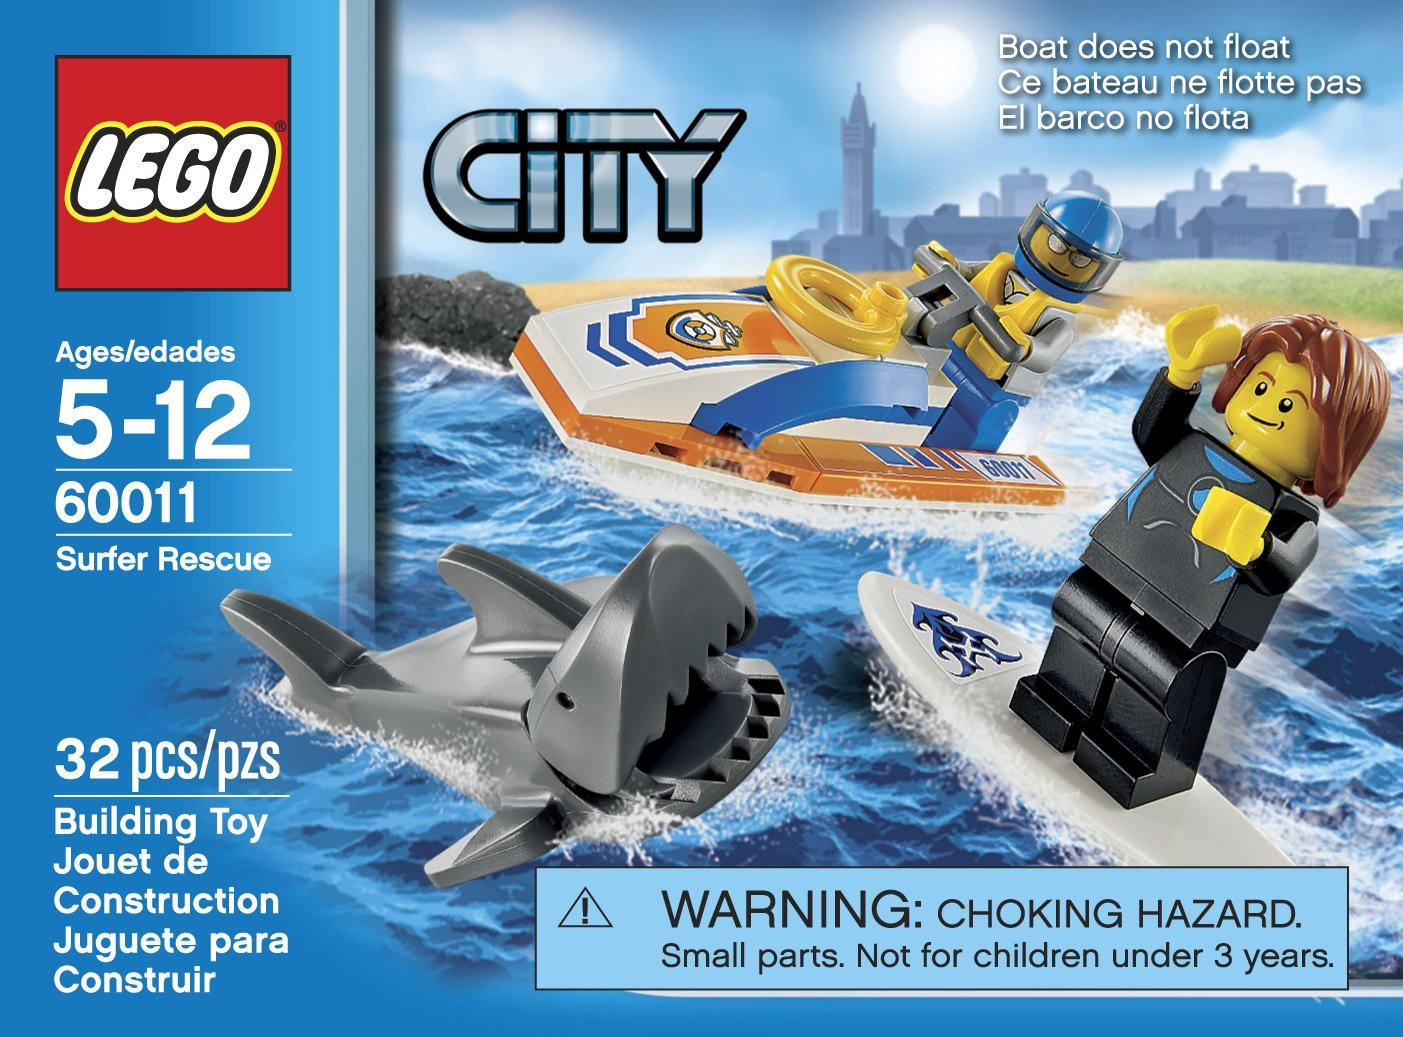 amazoncom lego city 60011 surfer rescue toy building set toys games - Lego City Bateau